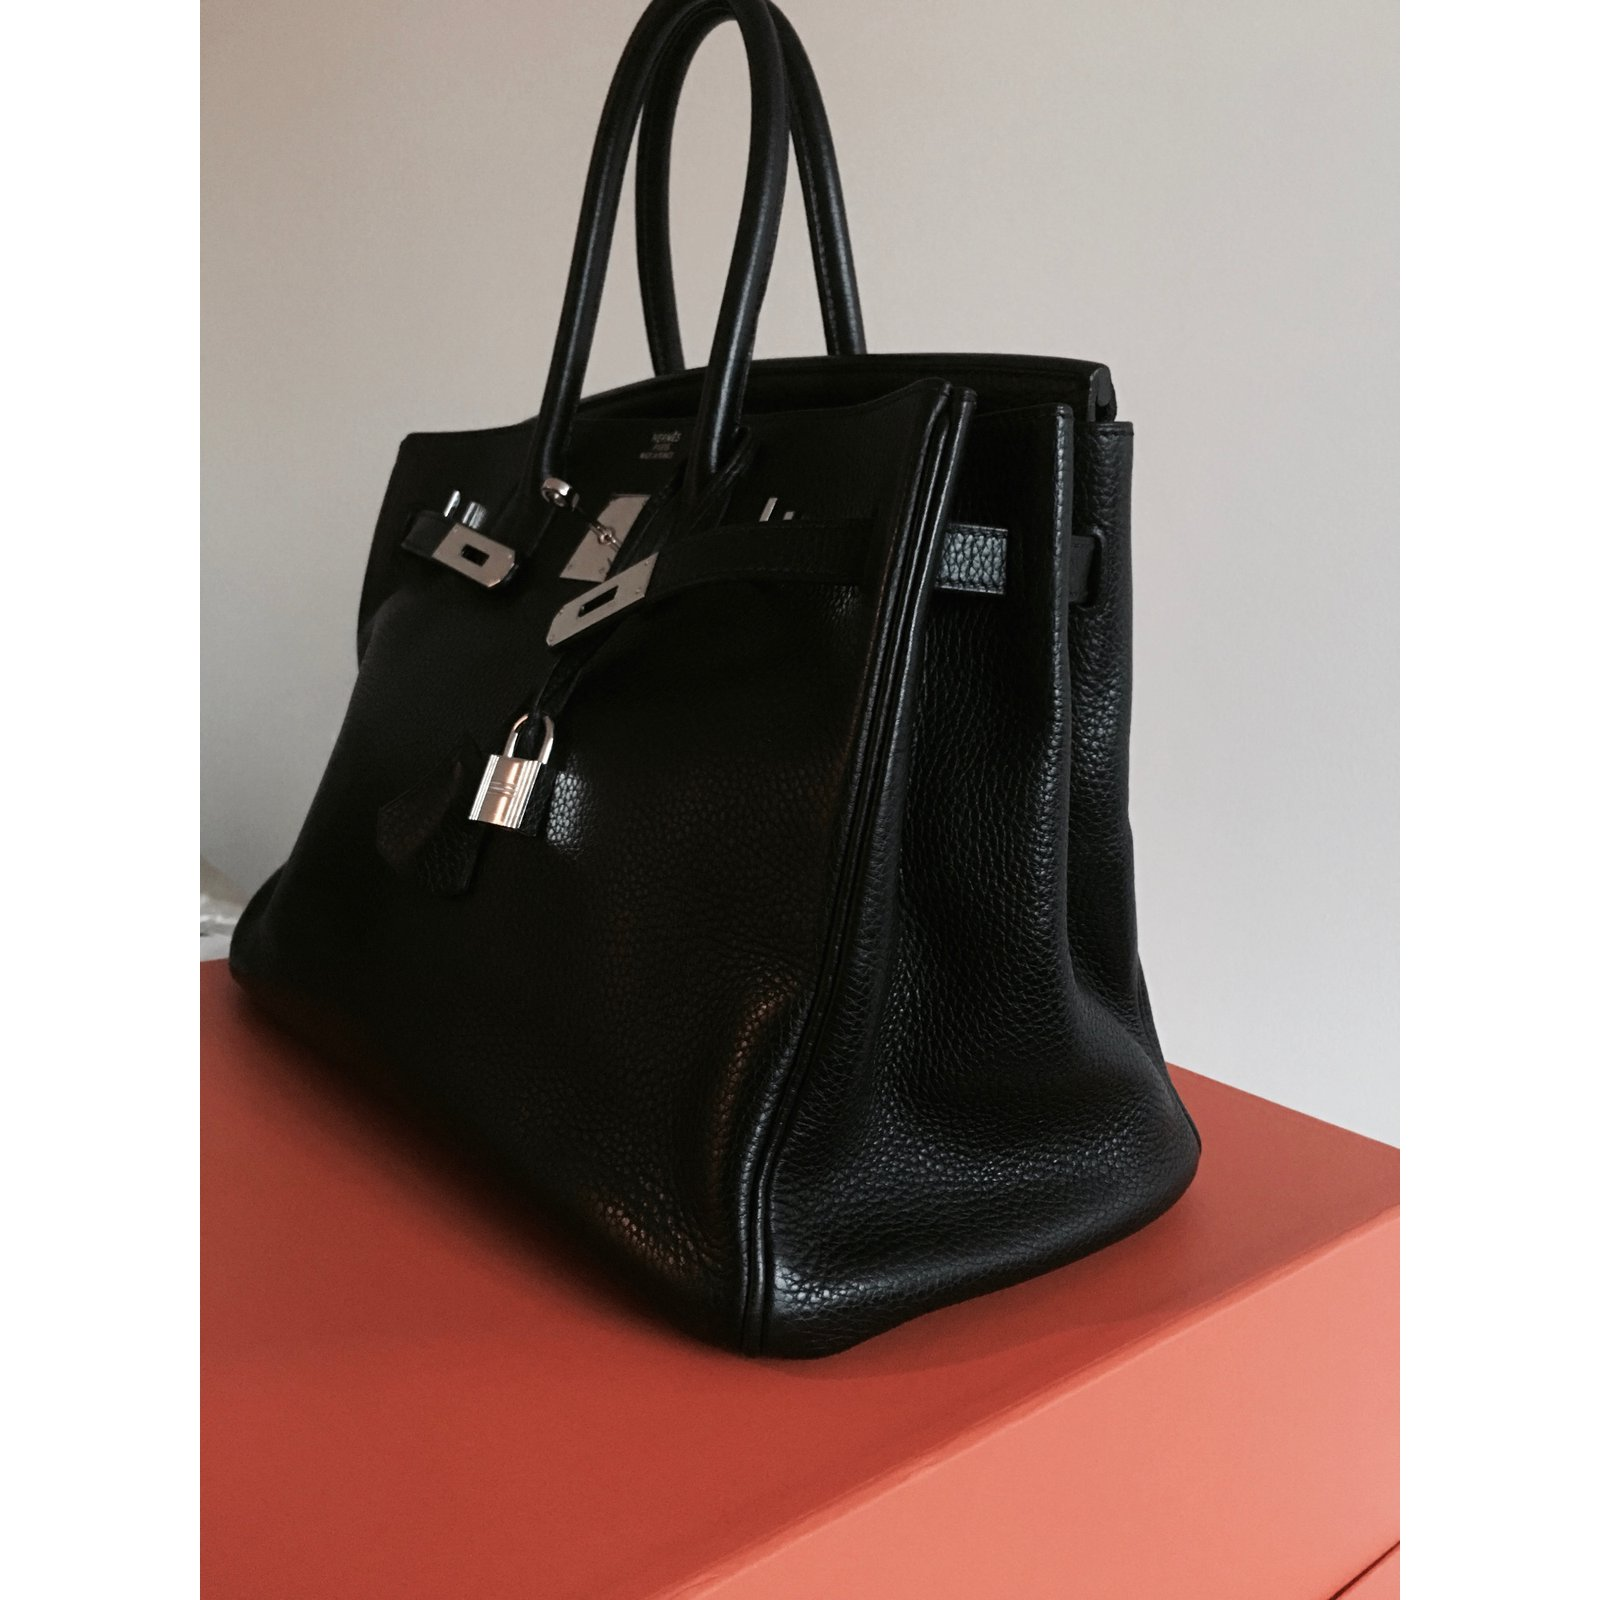 31abf55334 ... sweden sacs à main hermès sac hermes birkin cuir togo noir 35 cm cuir  noir ref ...